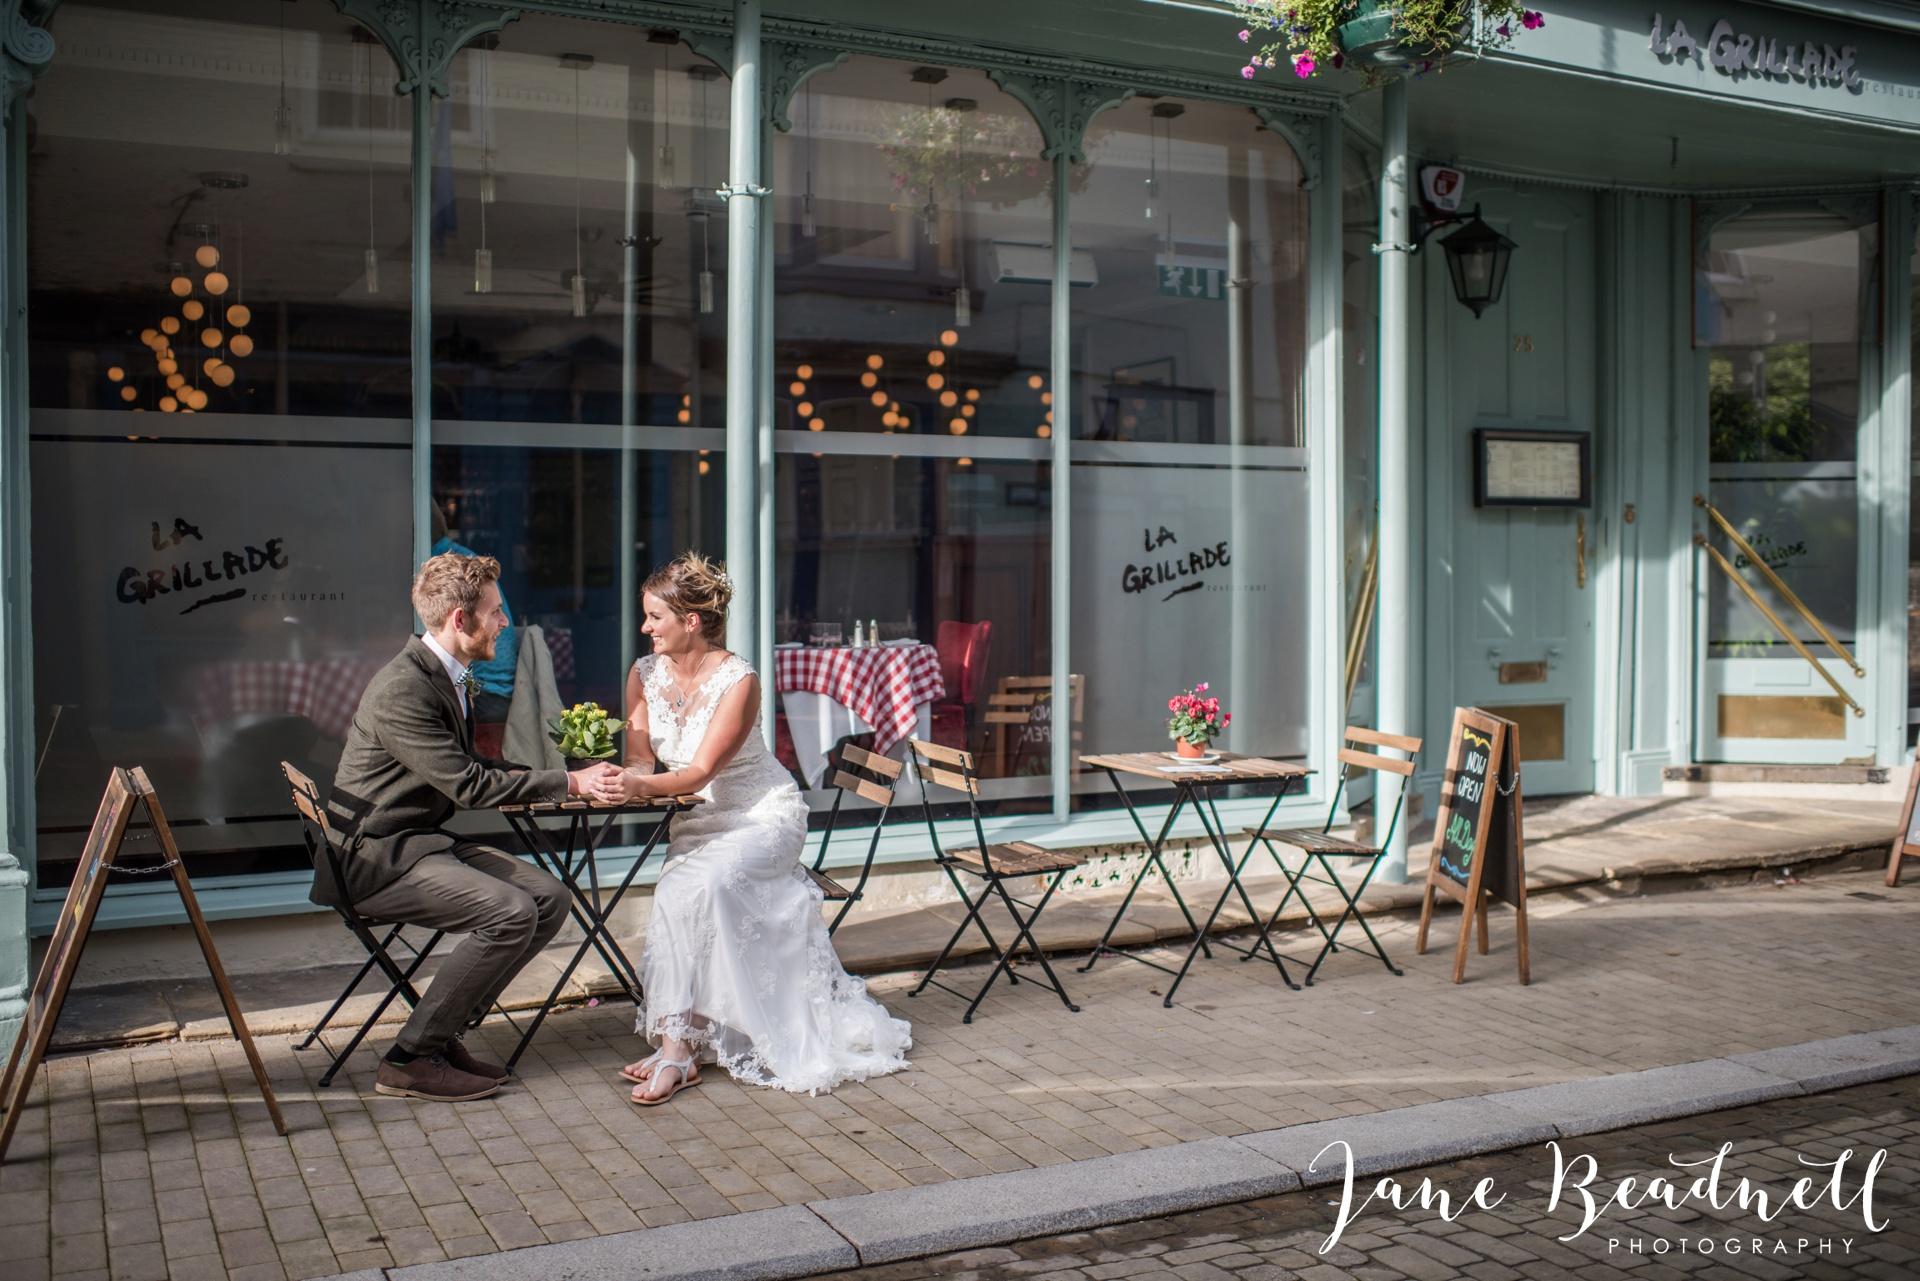 Jane Beadnell fine art wedding photographer The Old Deanery Ripon_0071